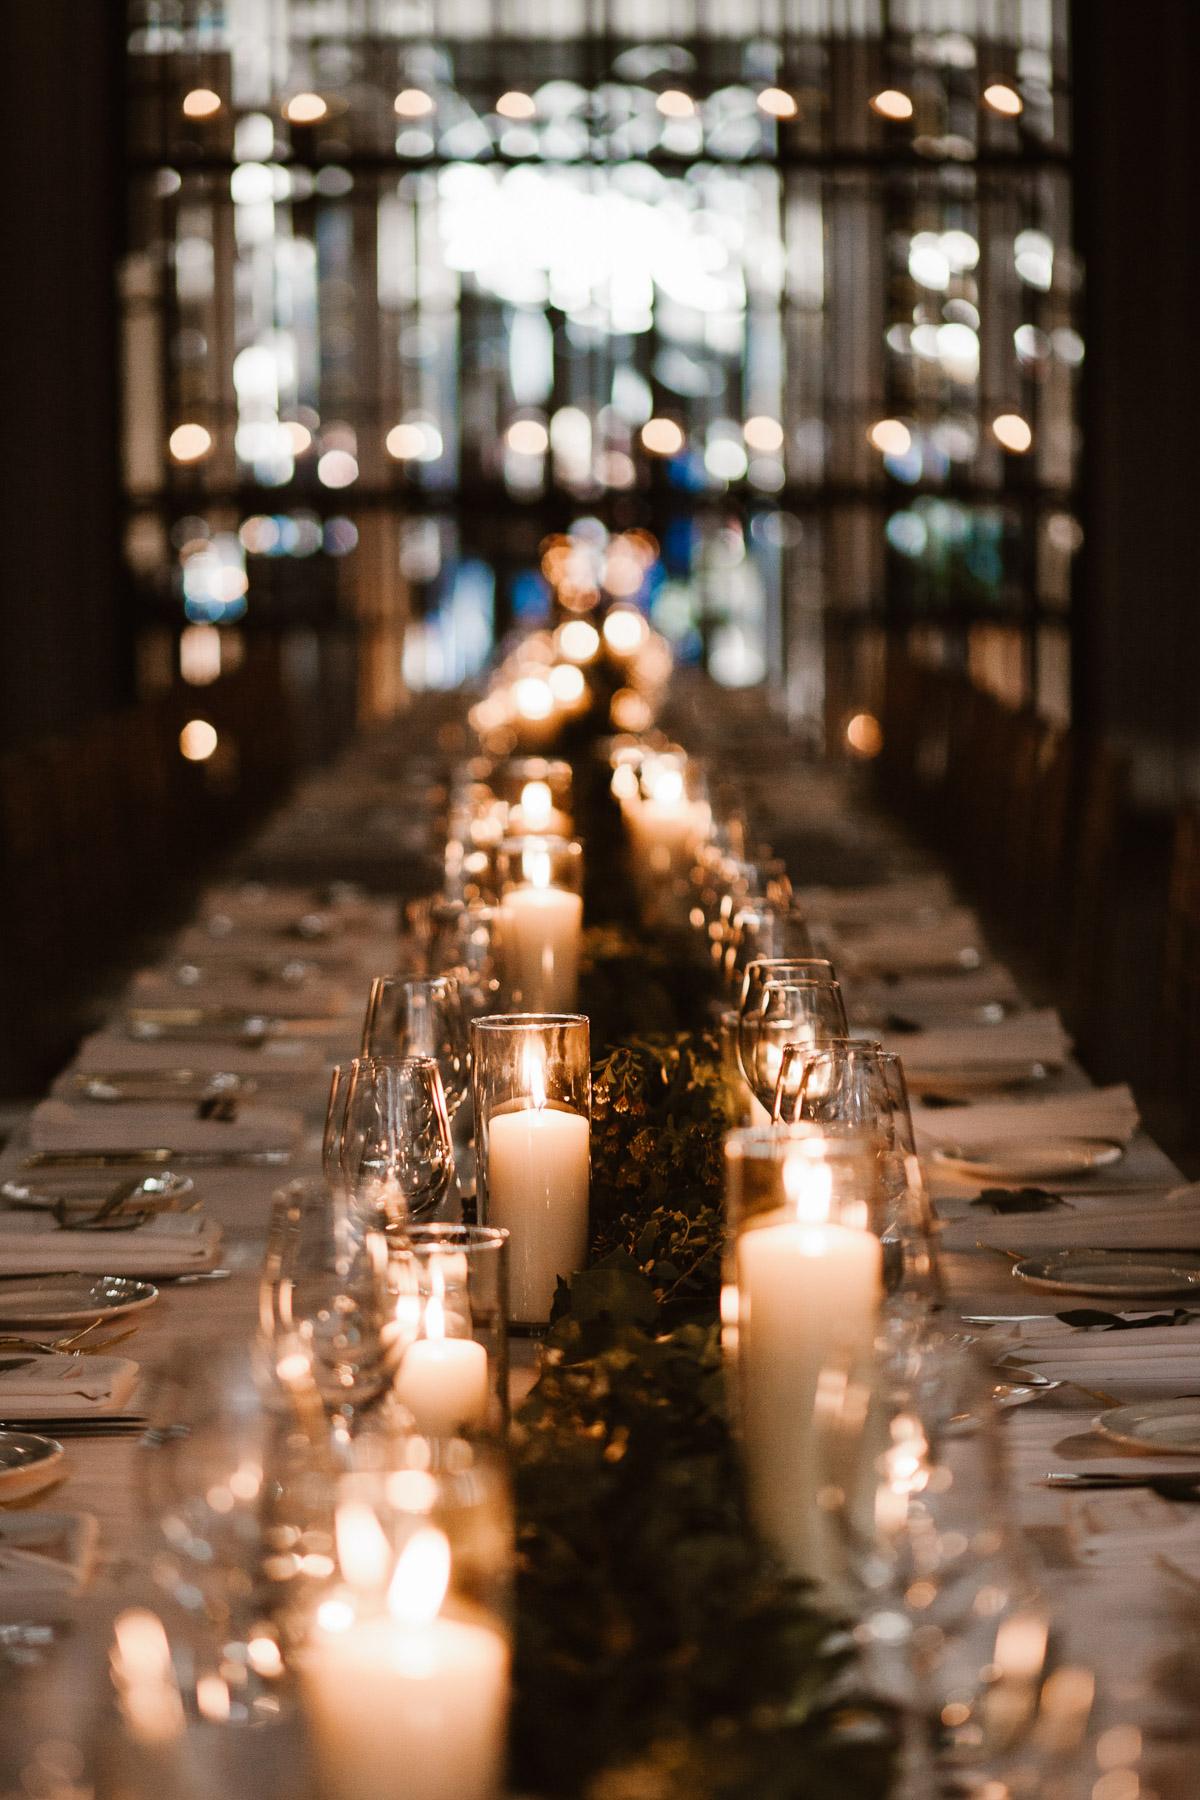 reed-photography-vineyard-bride-swish-list-stratus-winery-niagara-on-the-lake-wedding-50.jpg